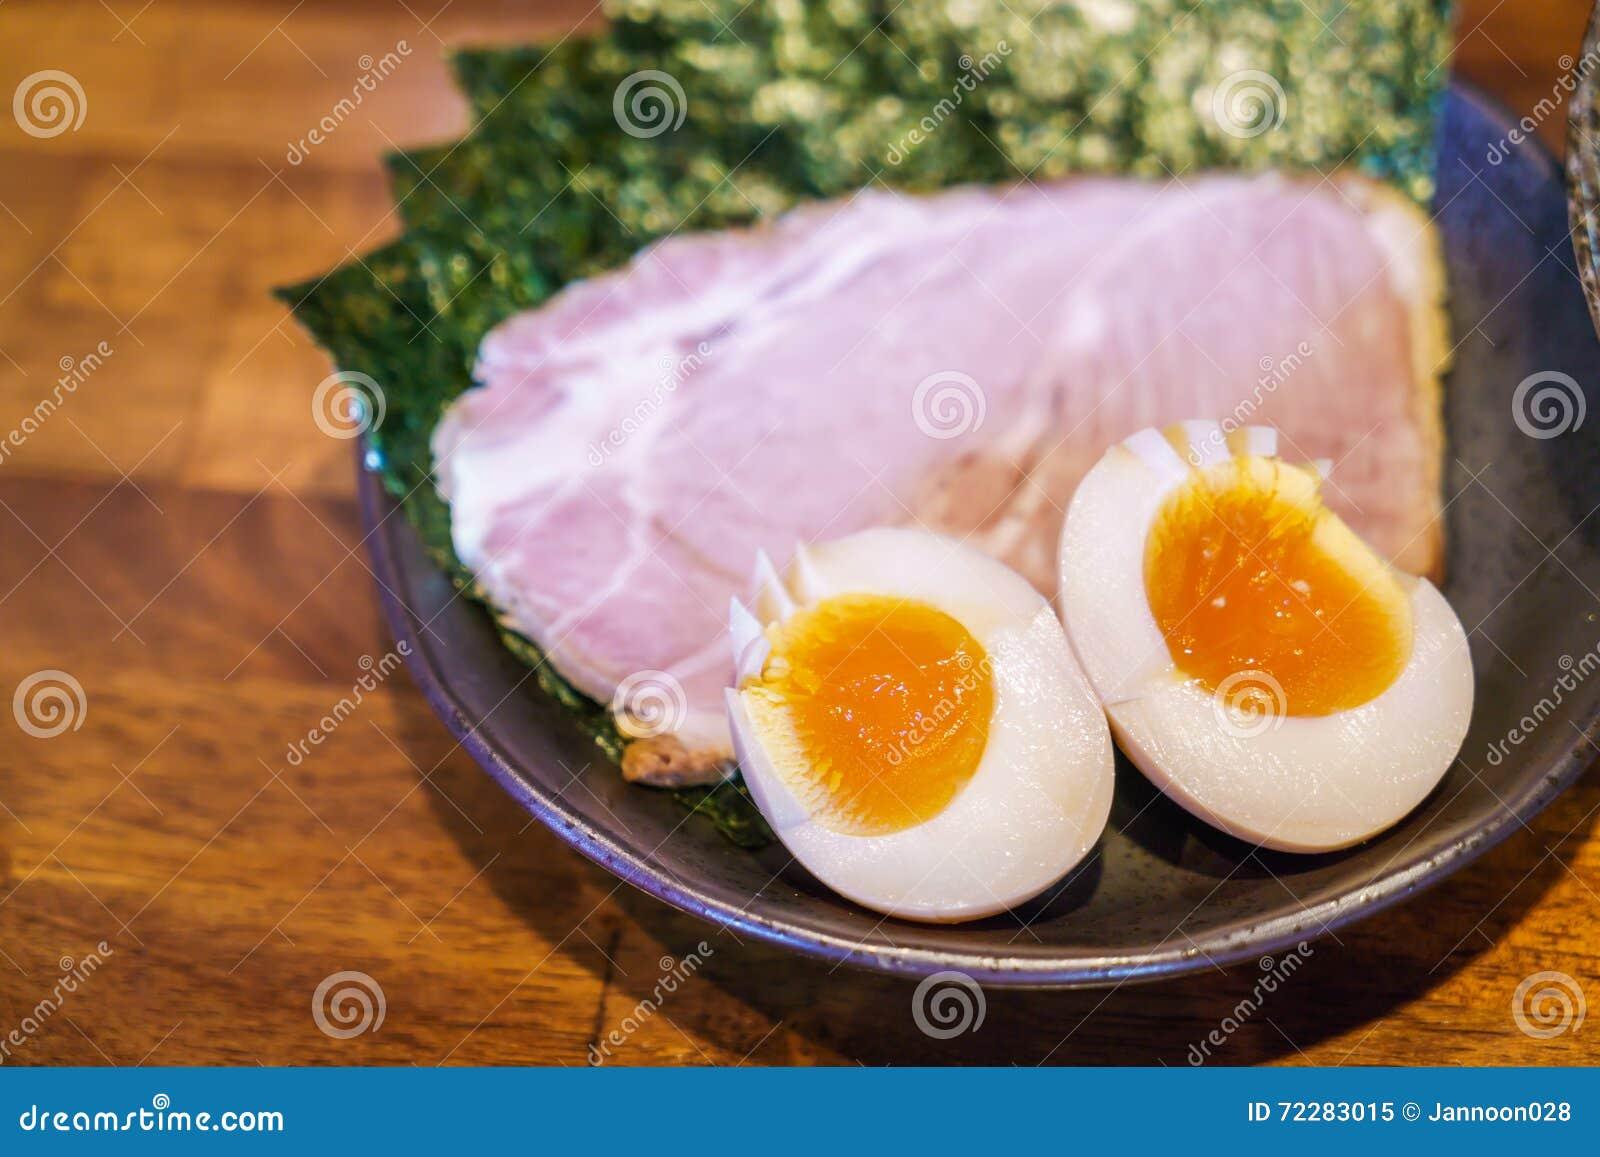 Download Японская лапша рамэнов на таблице Стоковое Изображение - изображение насчитывающей ресторан, nutritious: 72283015